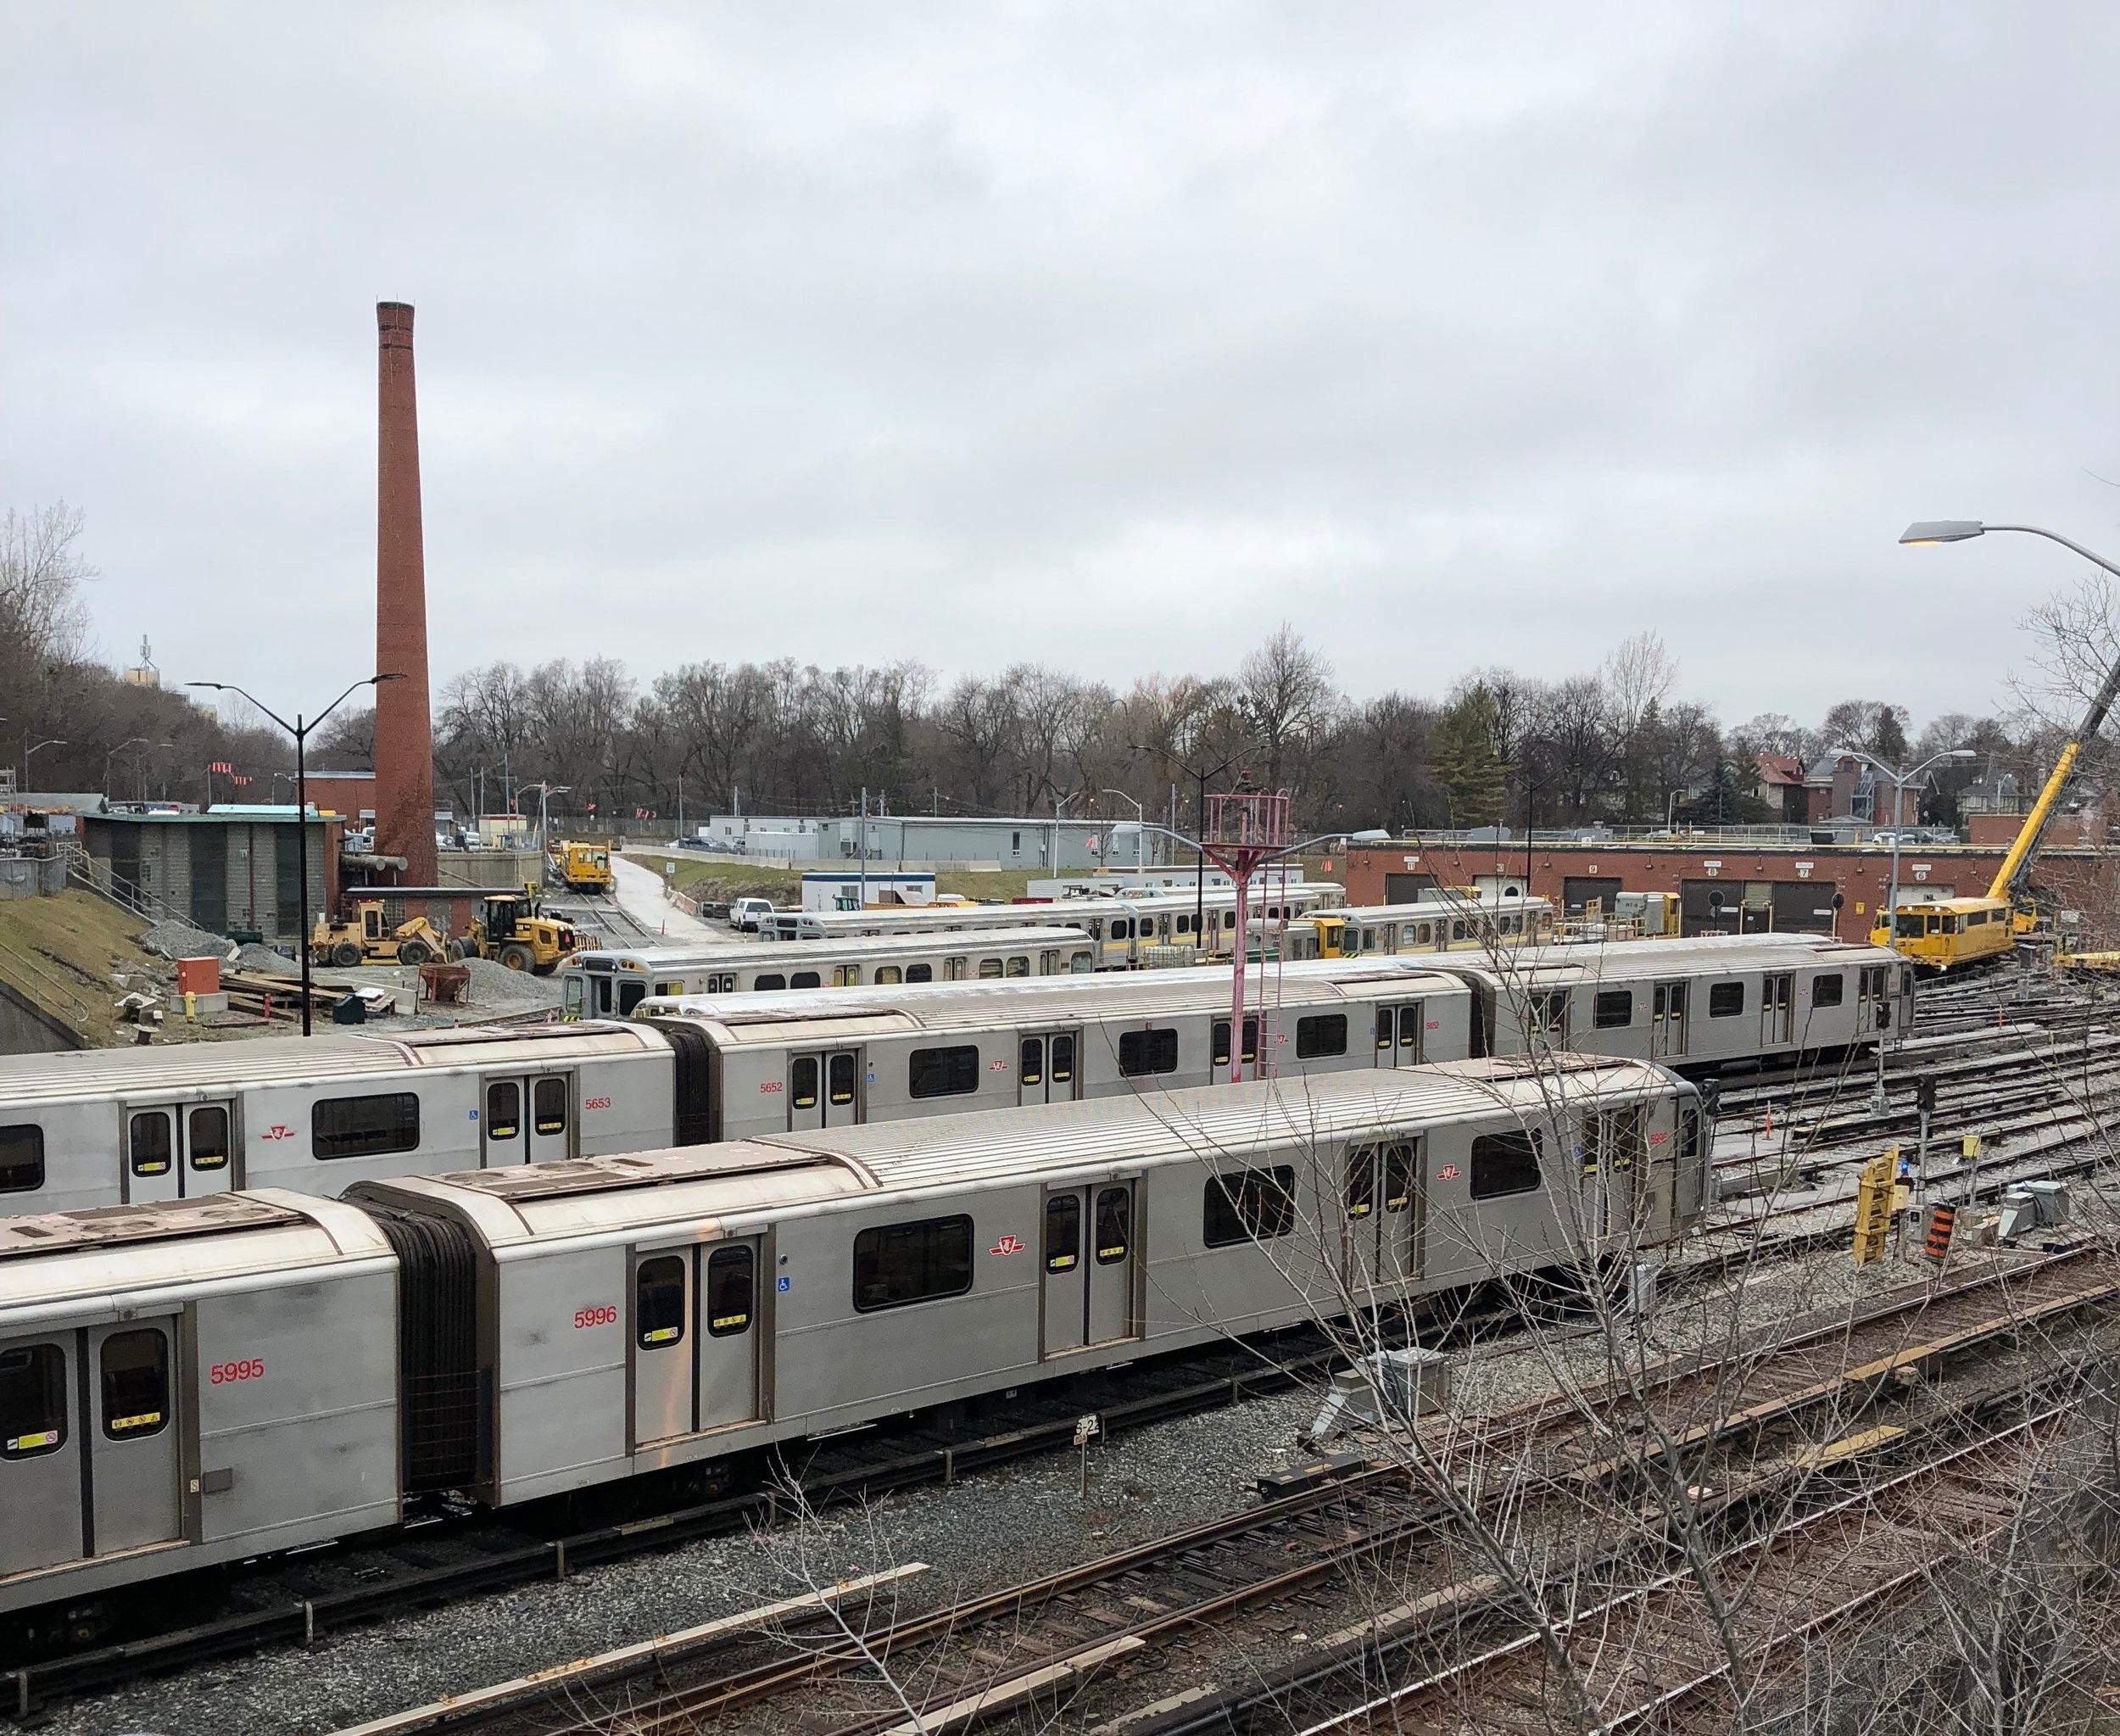 Subway cars in Davisville yard, looking north, December 27, 2018 Photographer: Davisville Post